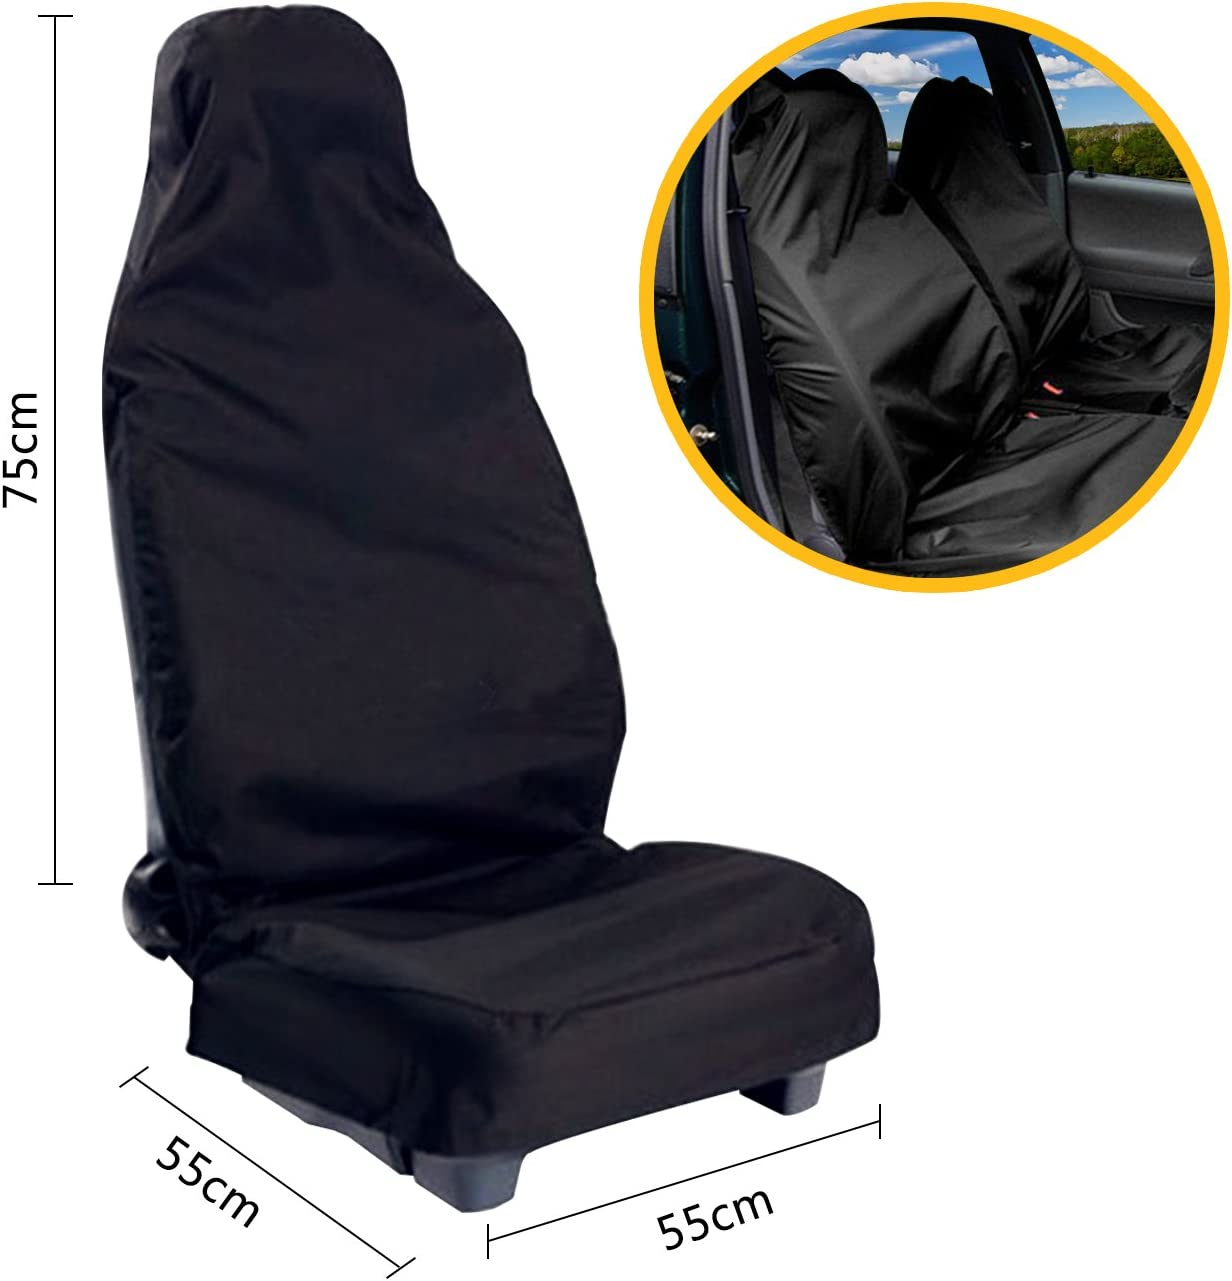 1 x taller ya referencia taller cubierta de asiento protección referencia sede protección universal